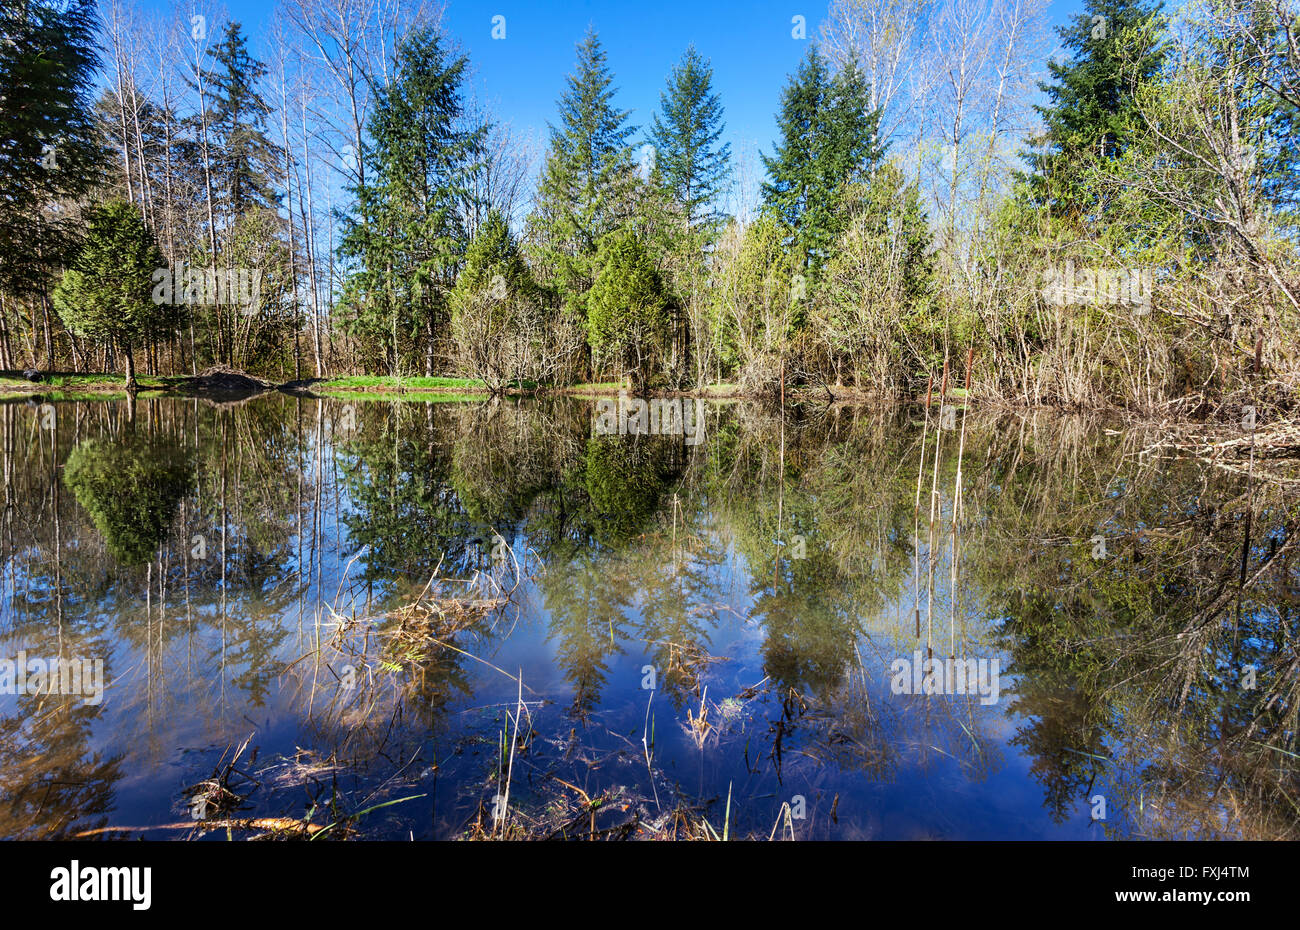 Stormwater retention pond - Stock Image